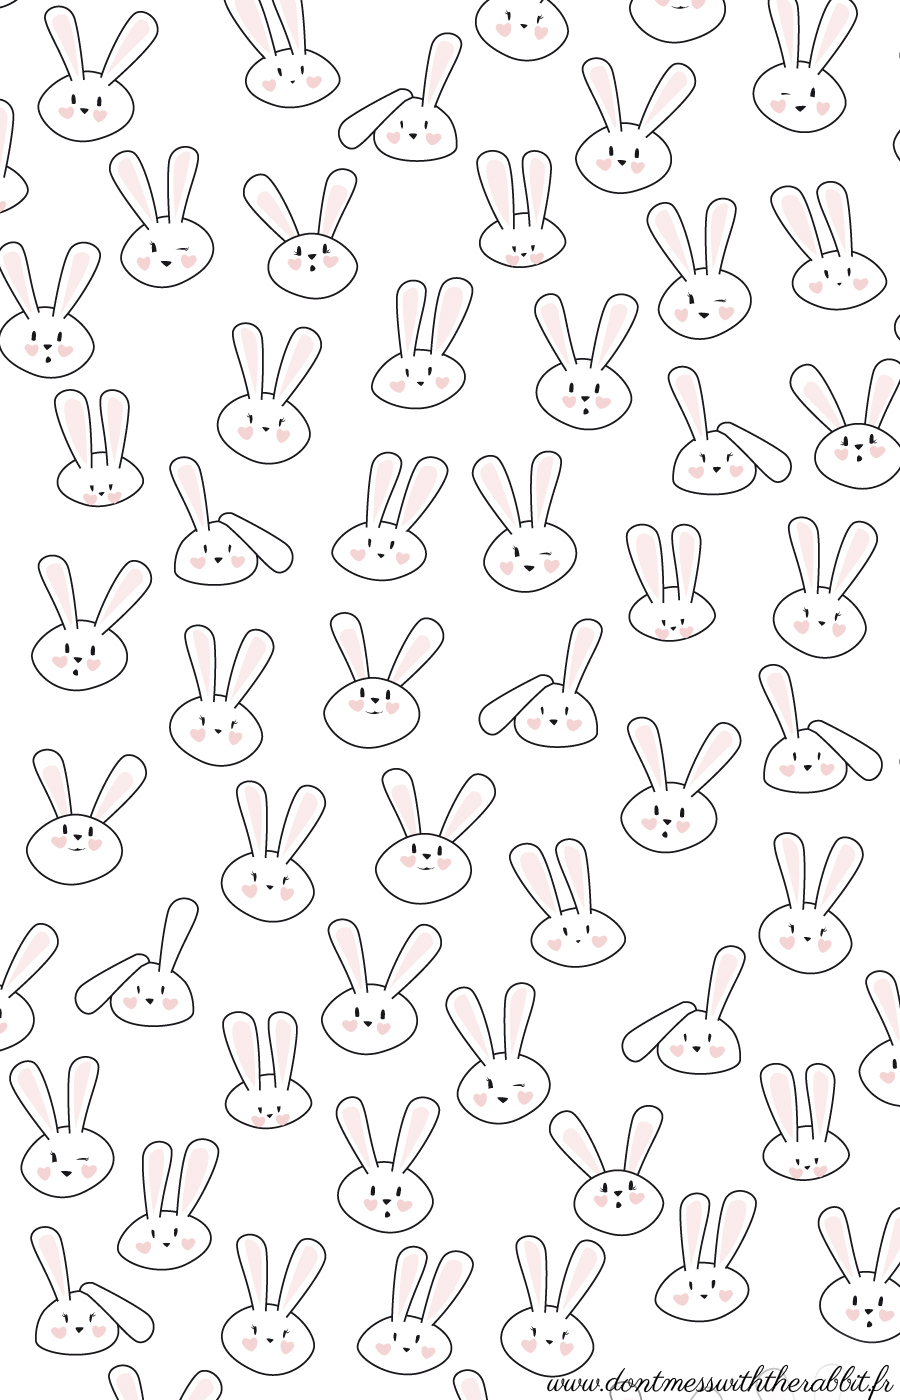 www.dontmesswiththerabbit.fr - fond ecran lapins copie